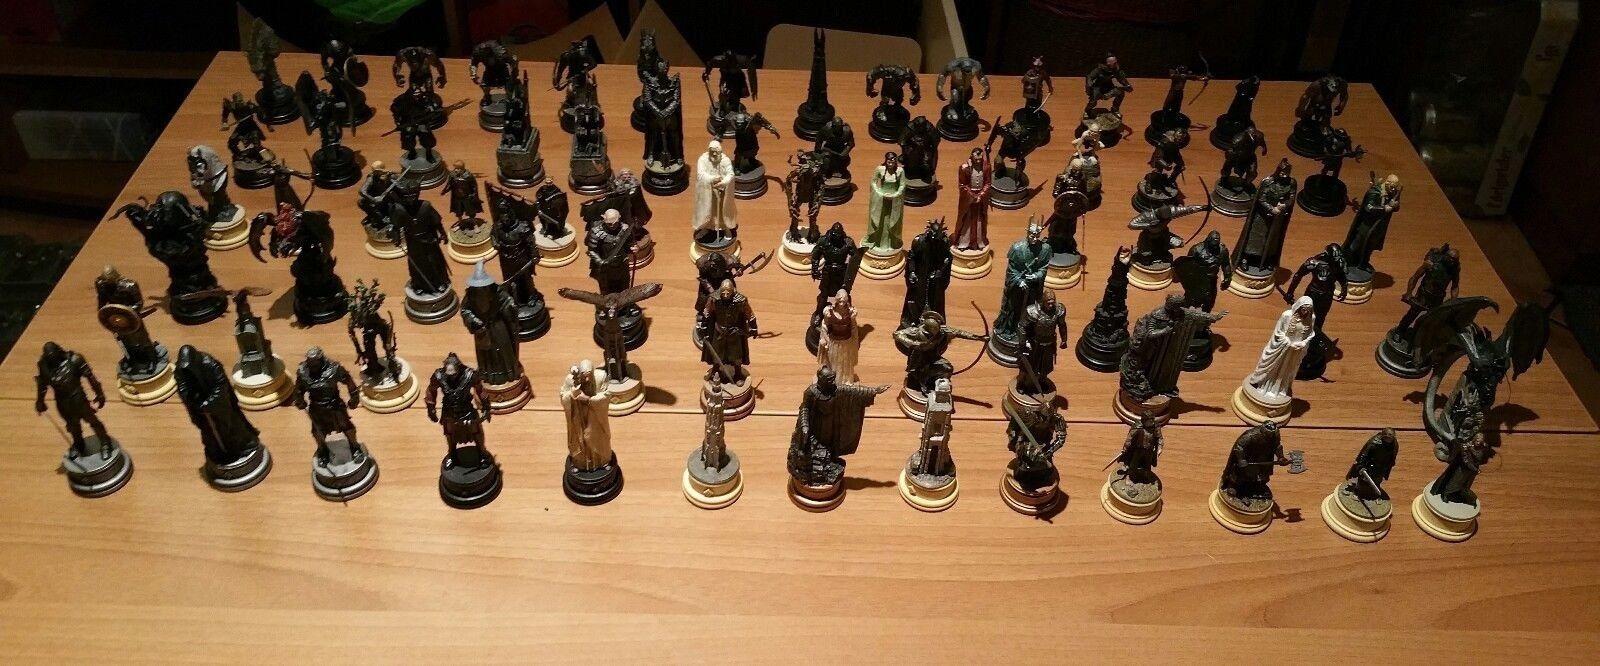 Noël fou fou fou saisir grand concours Eaglemoss Lord Of The Rings Chess 1eb081